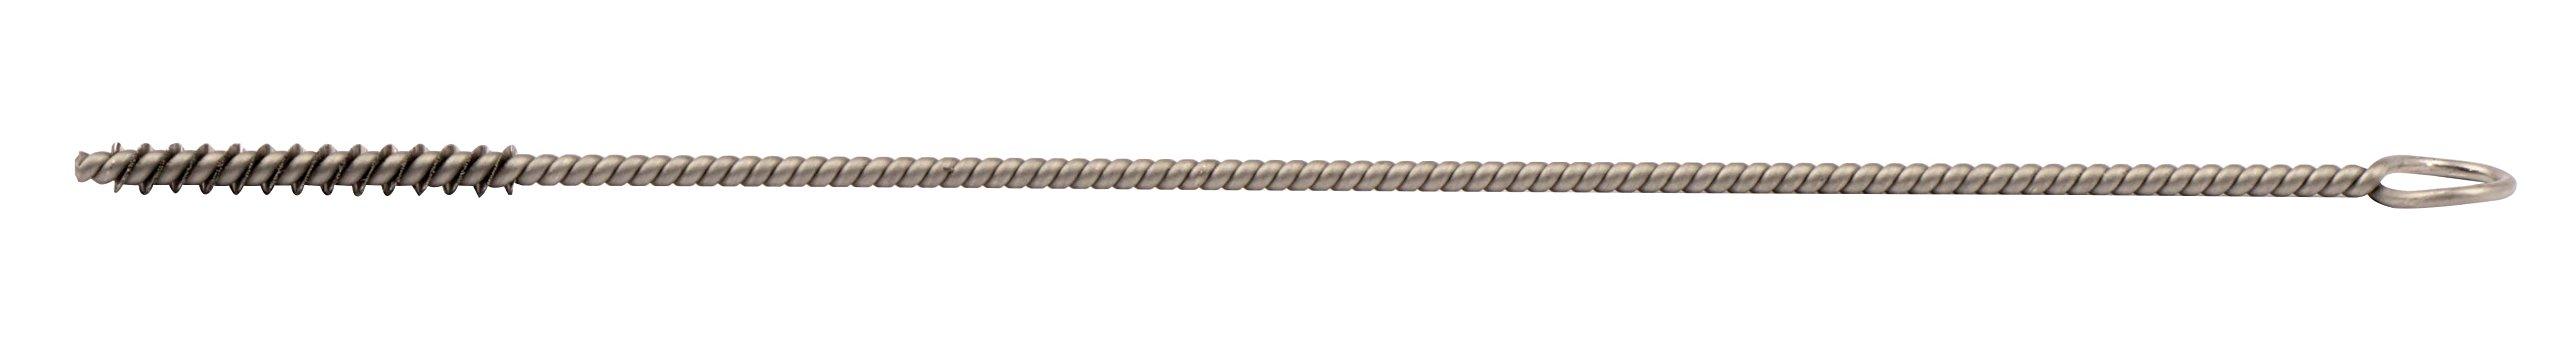 Weiler 21249 Hand Tube Brush, Single Stem/Single Spiral, 1/8'', 0.03'' Stainless Steel Wire Fill, 1'' Length (Pack of 10)